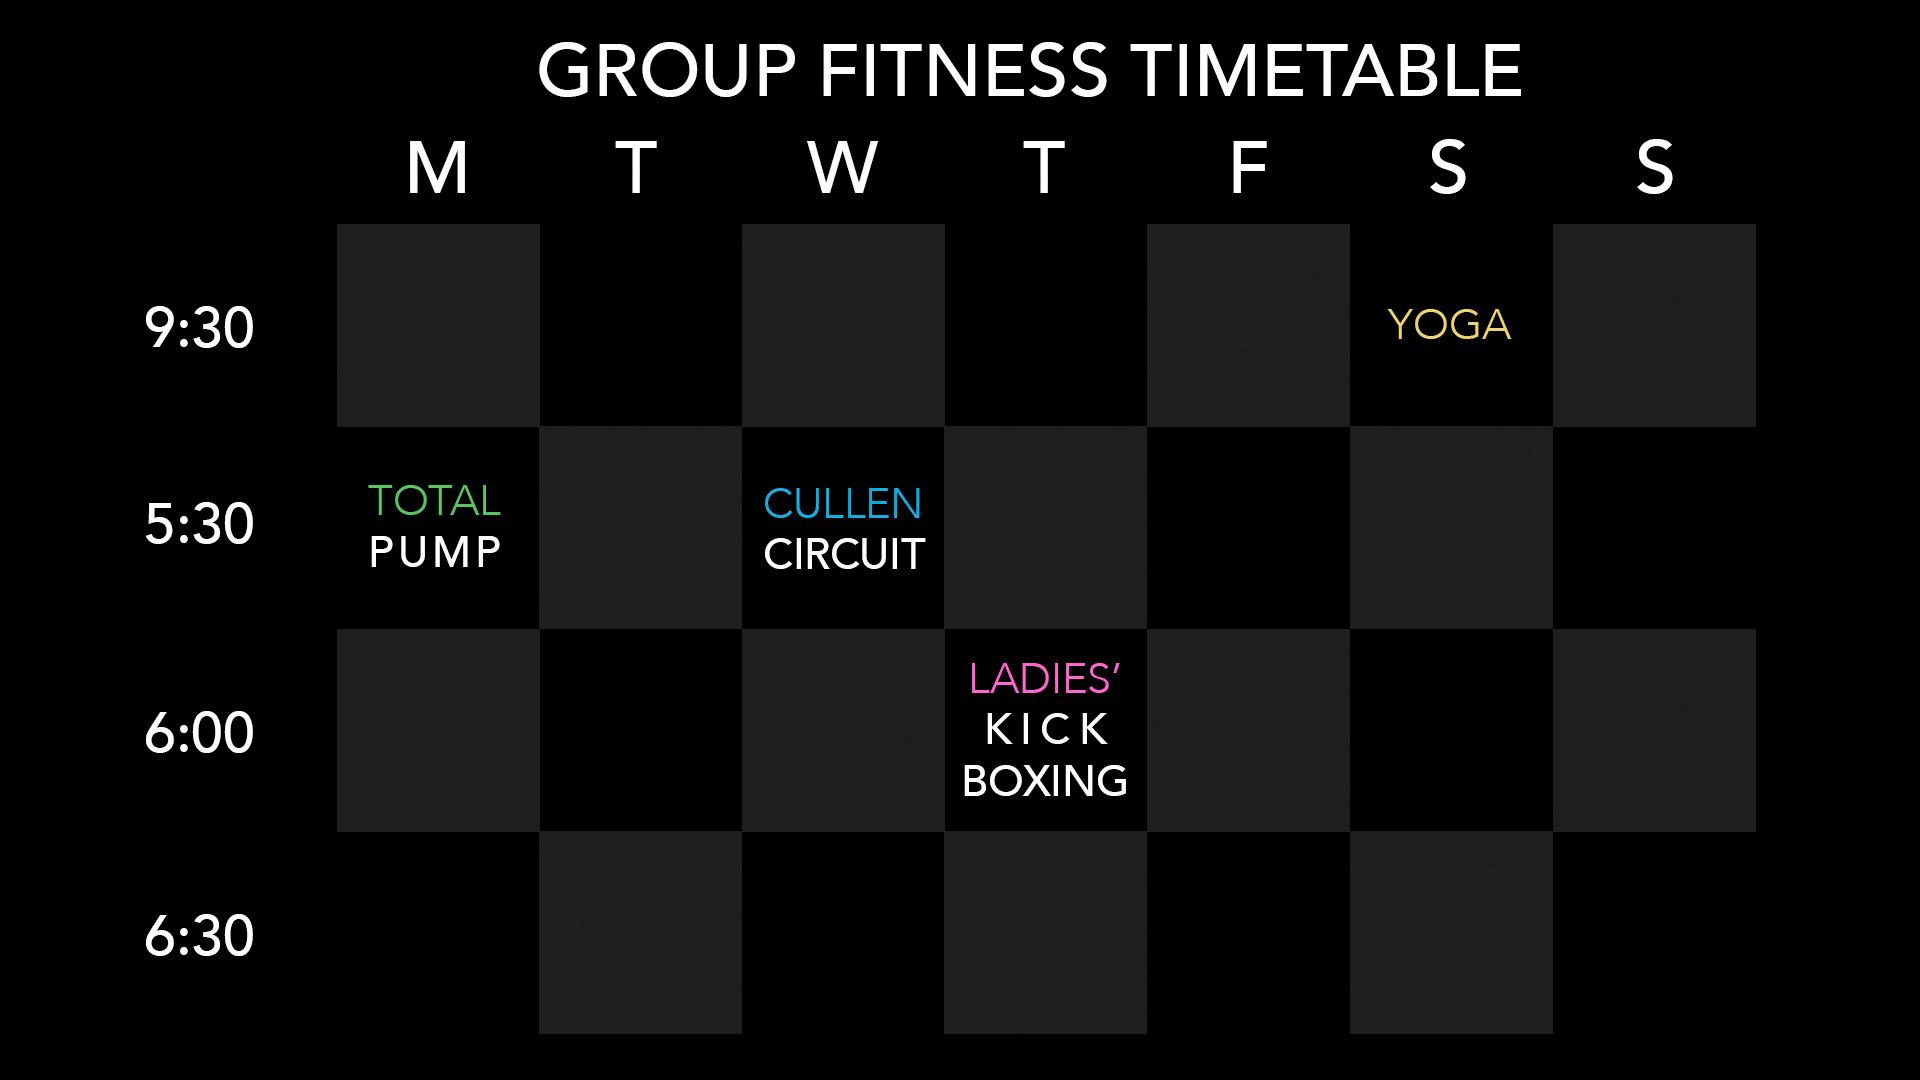 Group-Fitness-Timetable.jpg